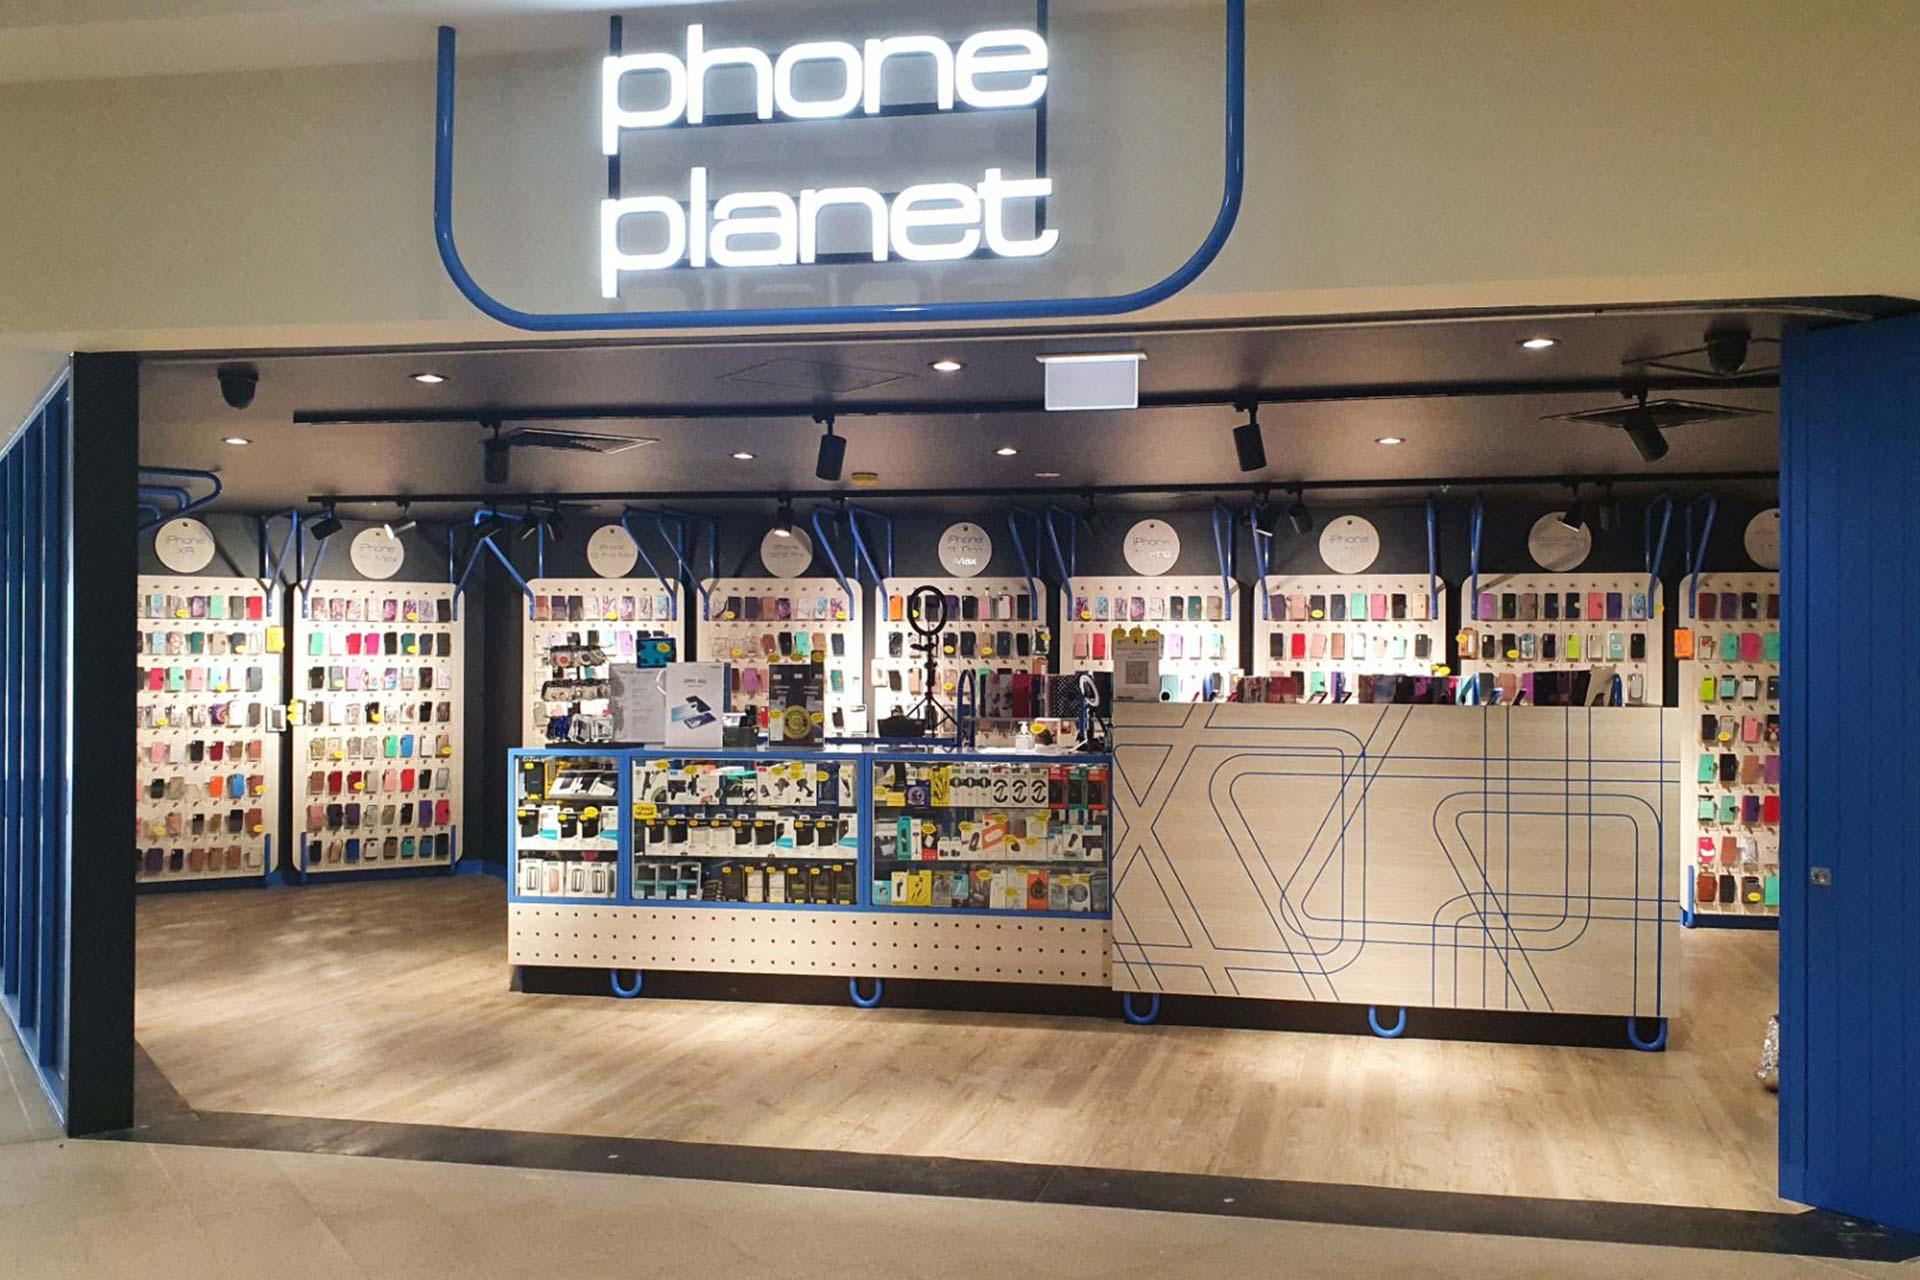 Phone planet shop in Warnbro